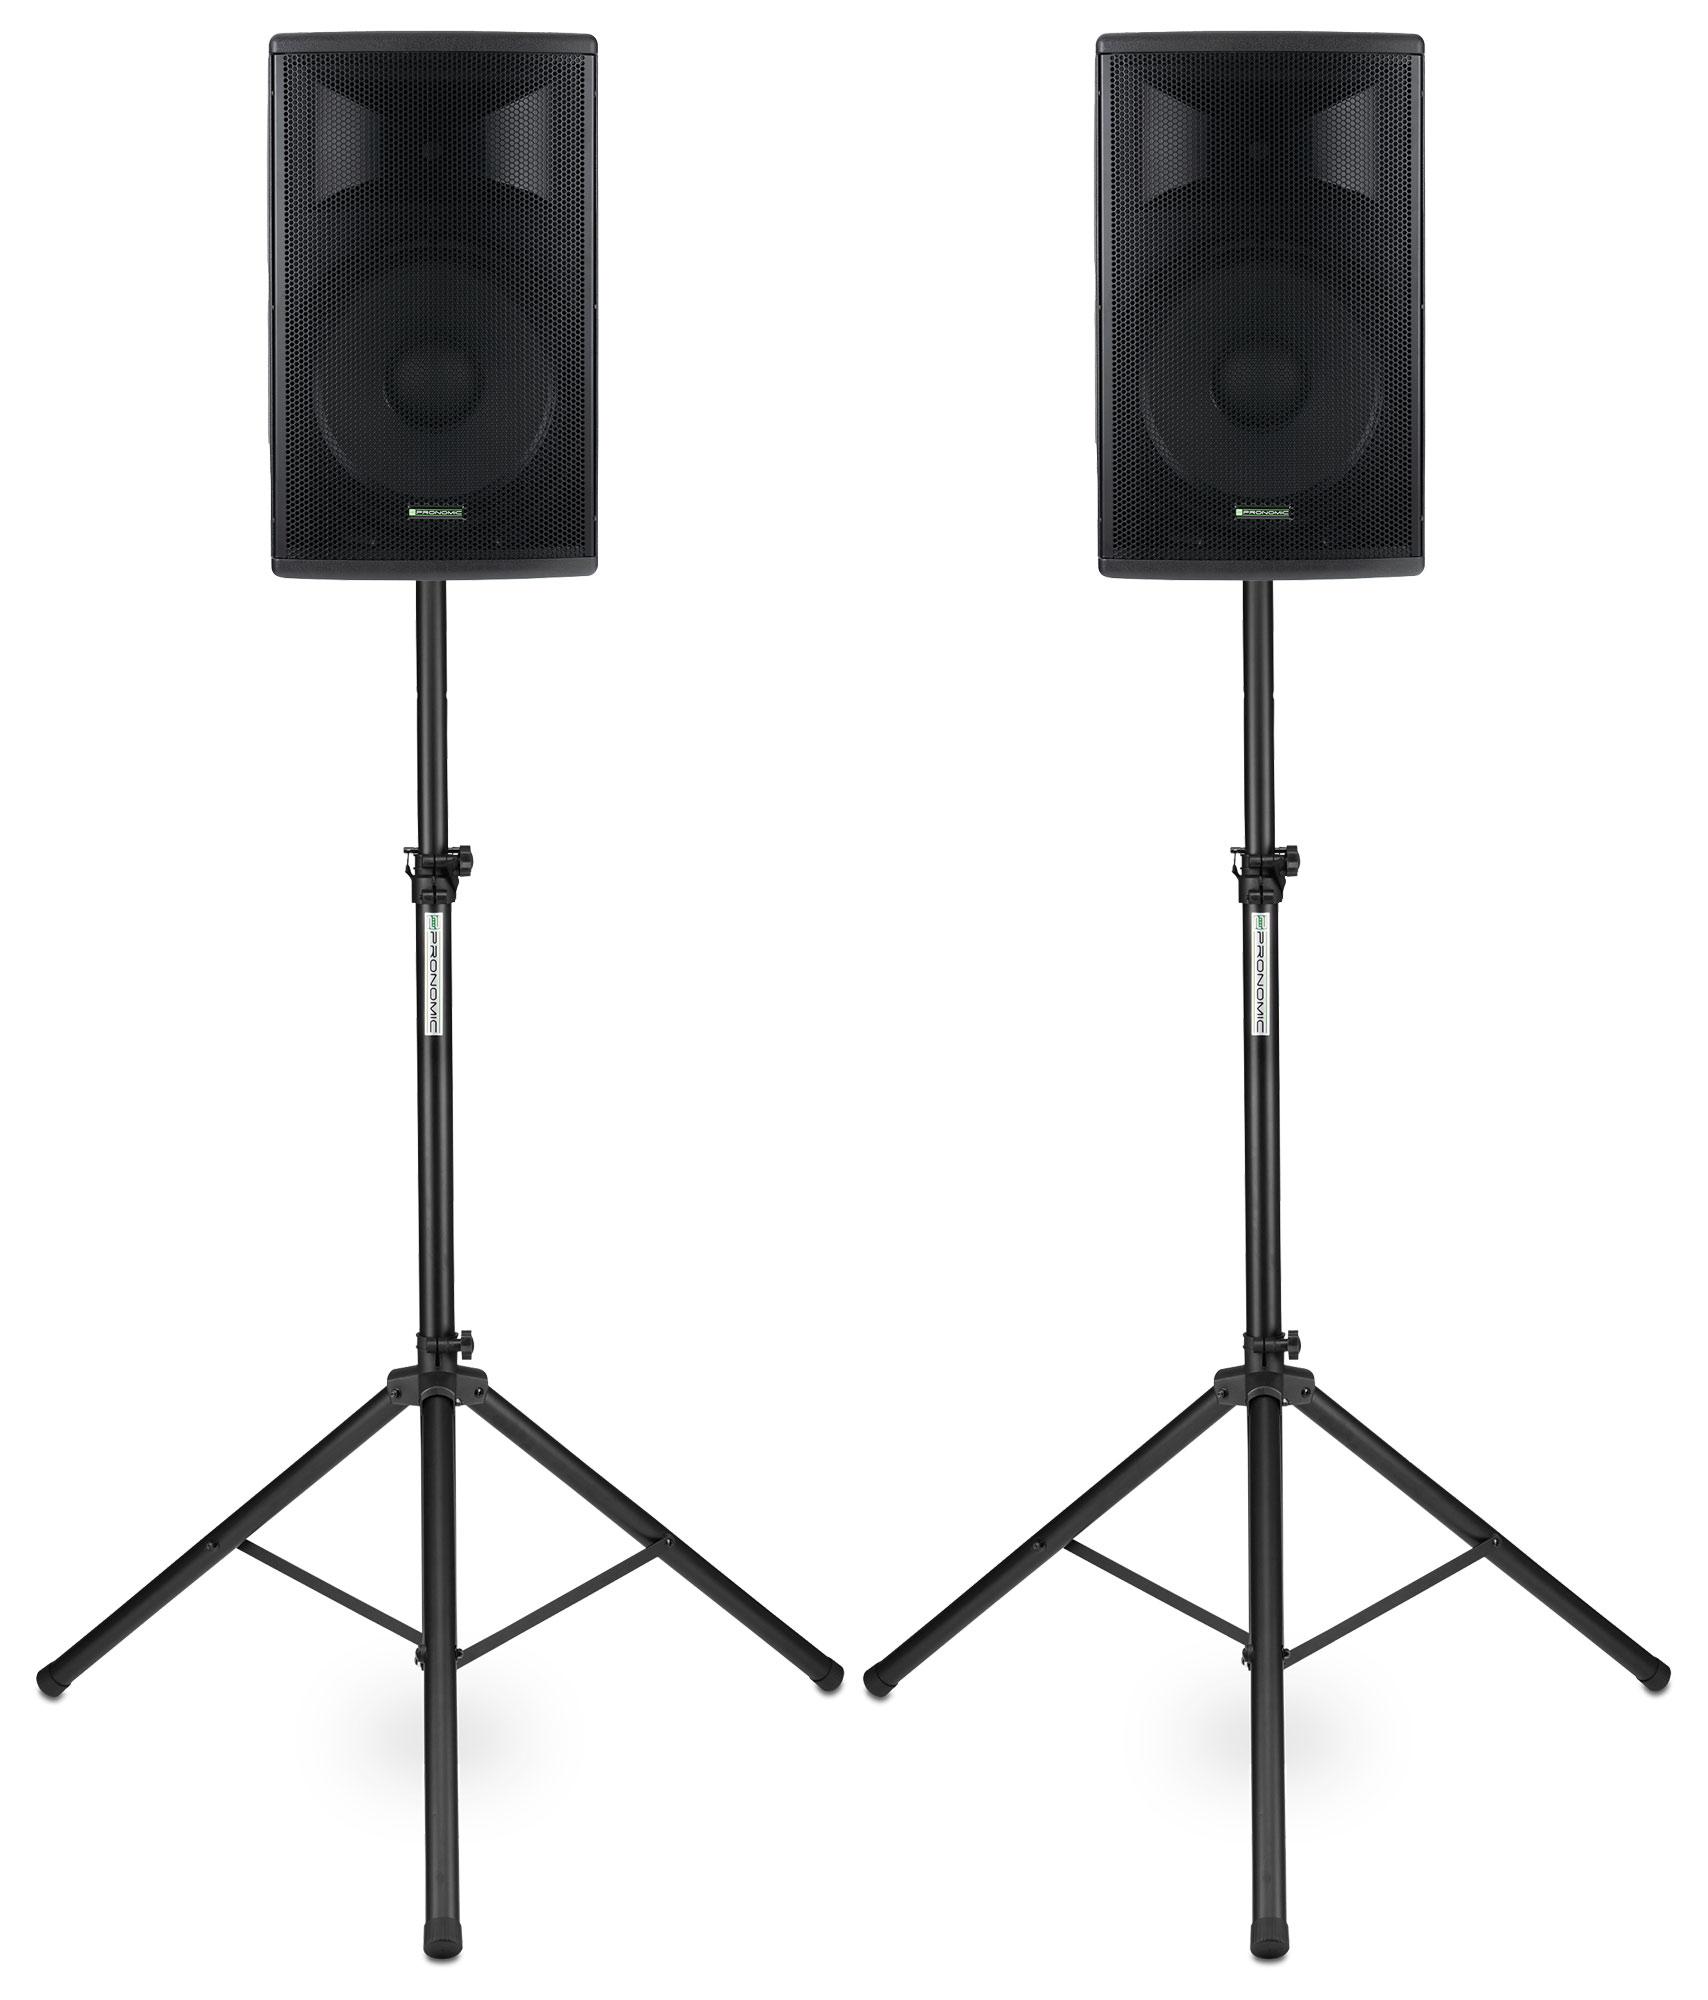 Paboxen - Pronomic E 212 MA 12 Aktivbox 500 Watt Stativ Set - Onlineshop Musikhaus Kirstein